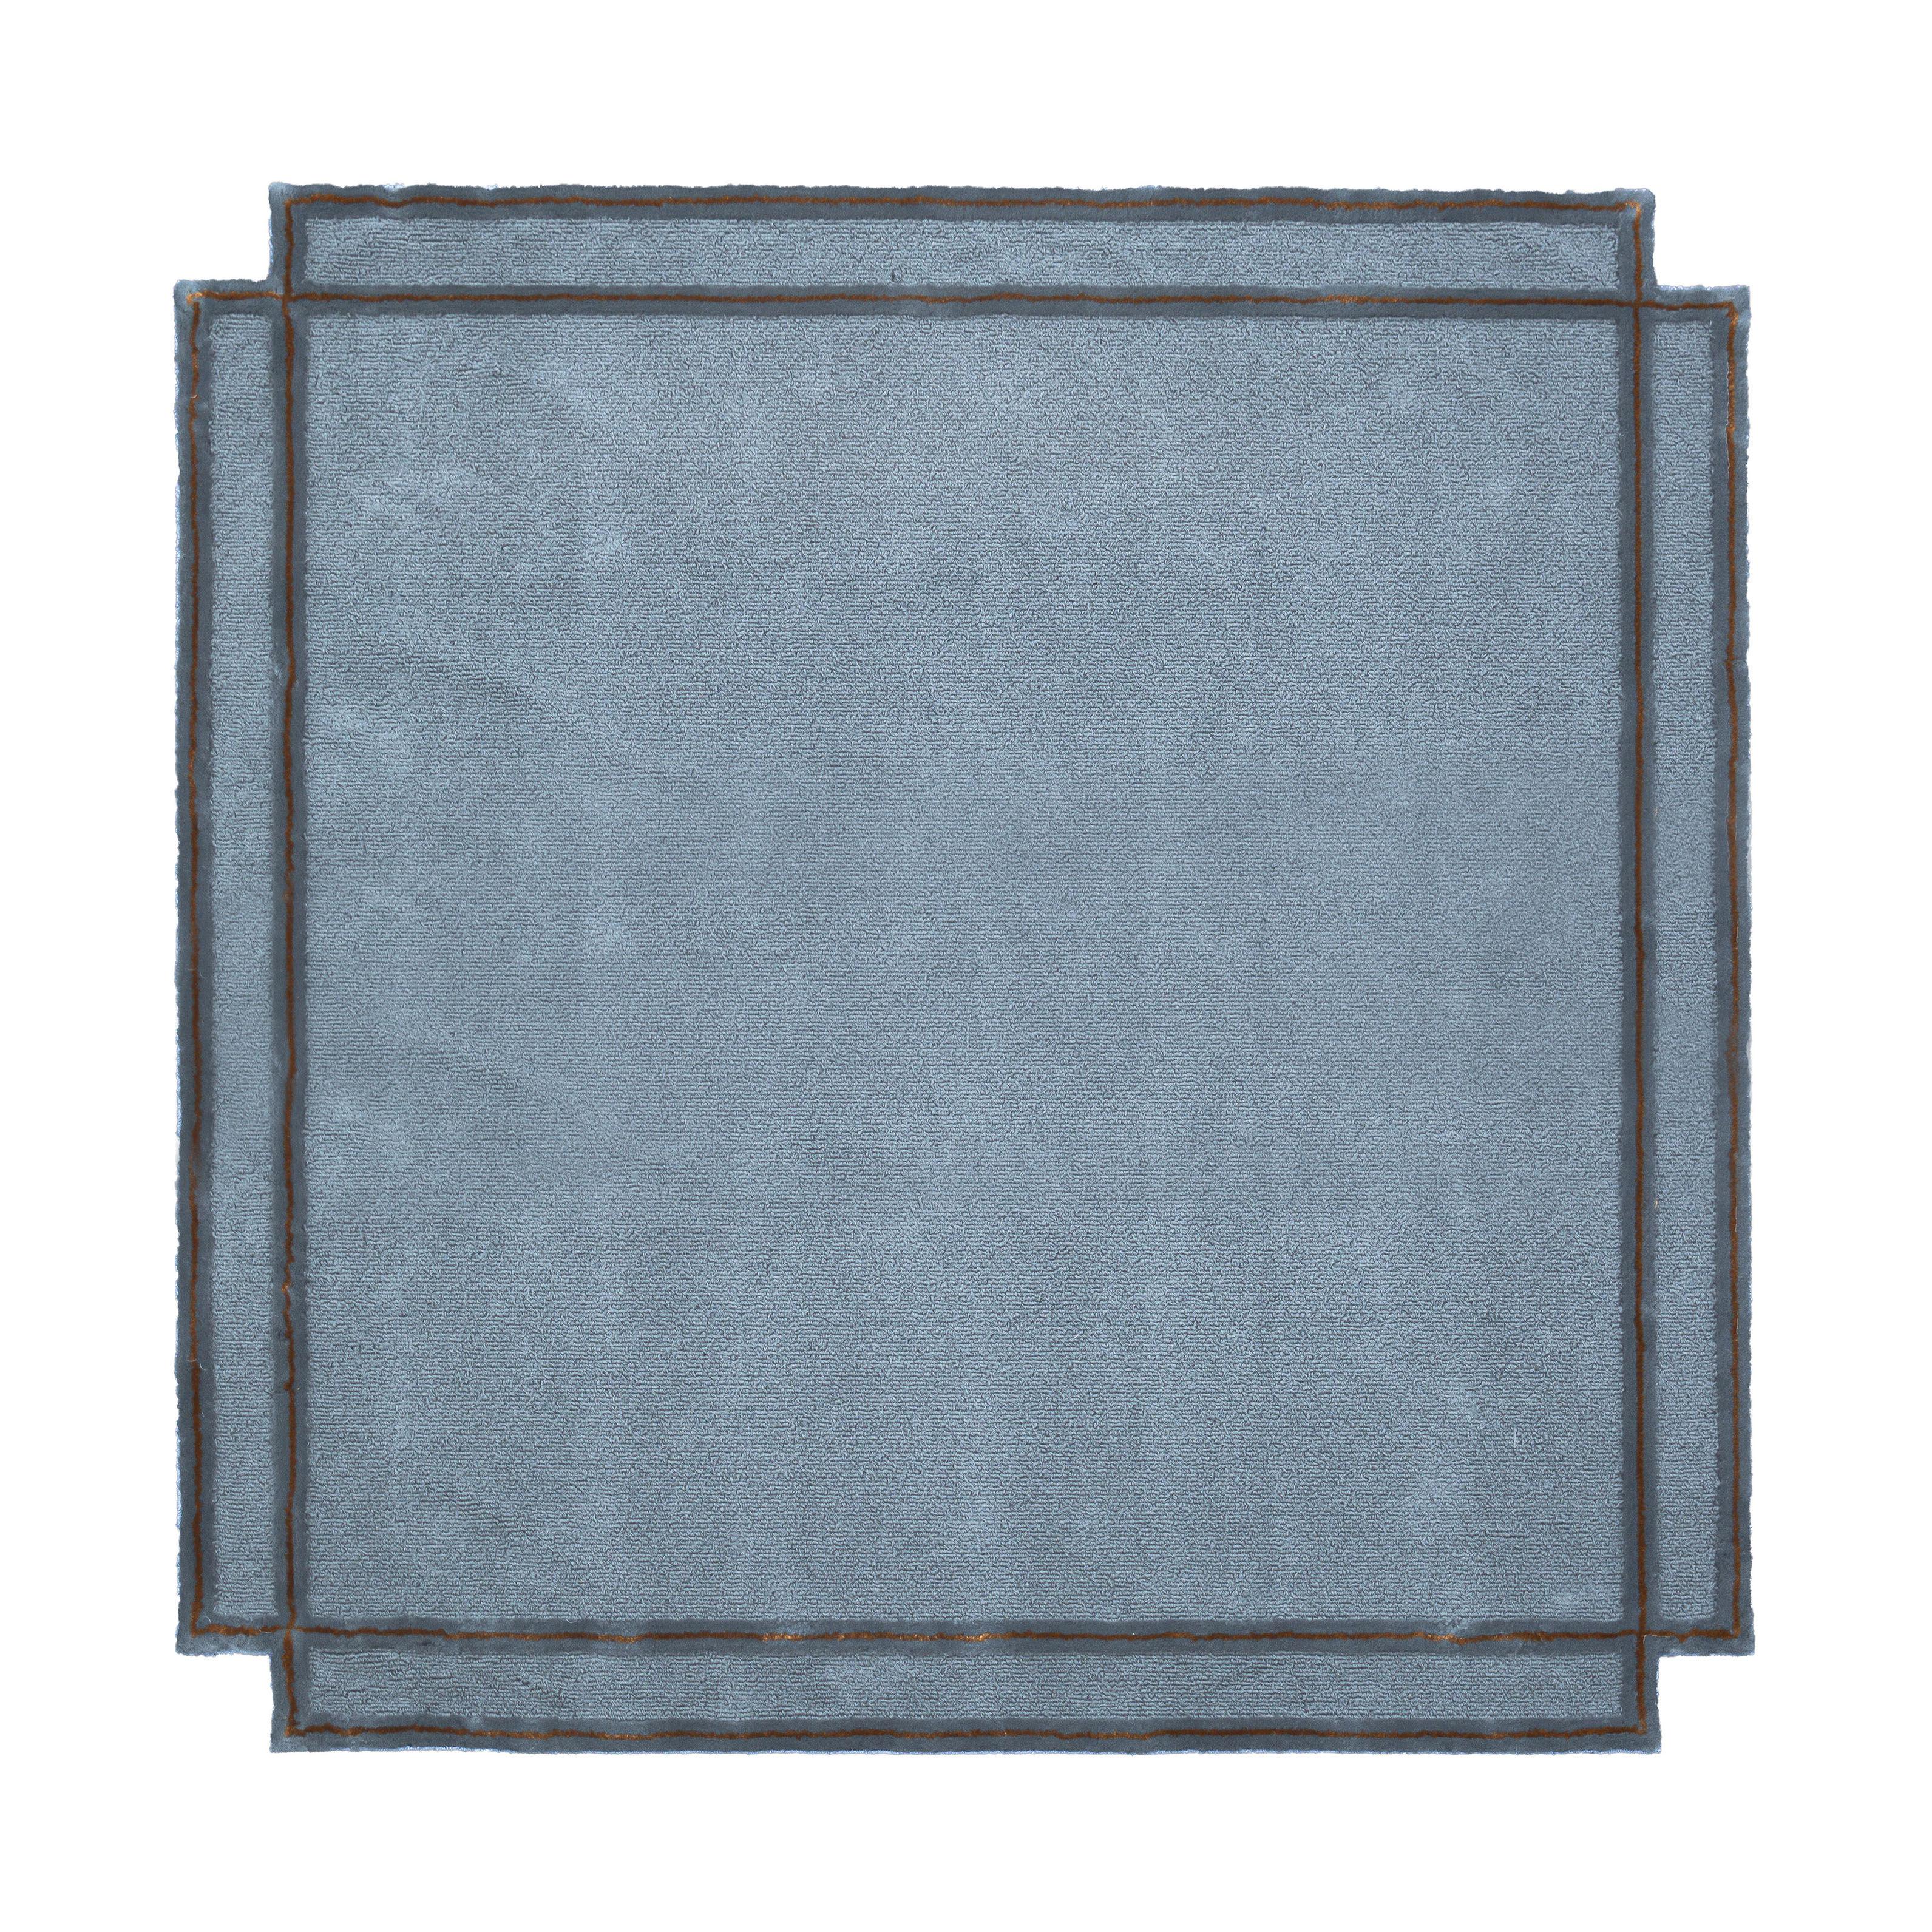 Decoration - Rugs - Volentieri Cornice Rug - / by Inga Sempé - 240 x 240 cm by Magis - Cold grey - Linen, Viscose